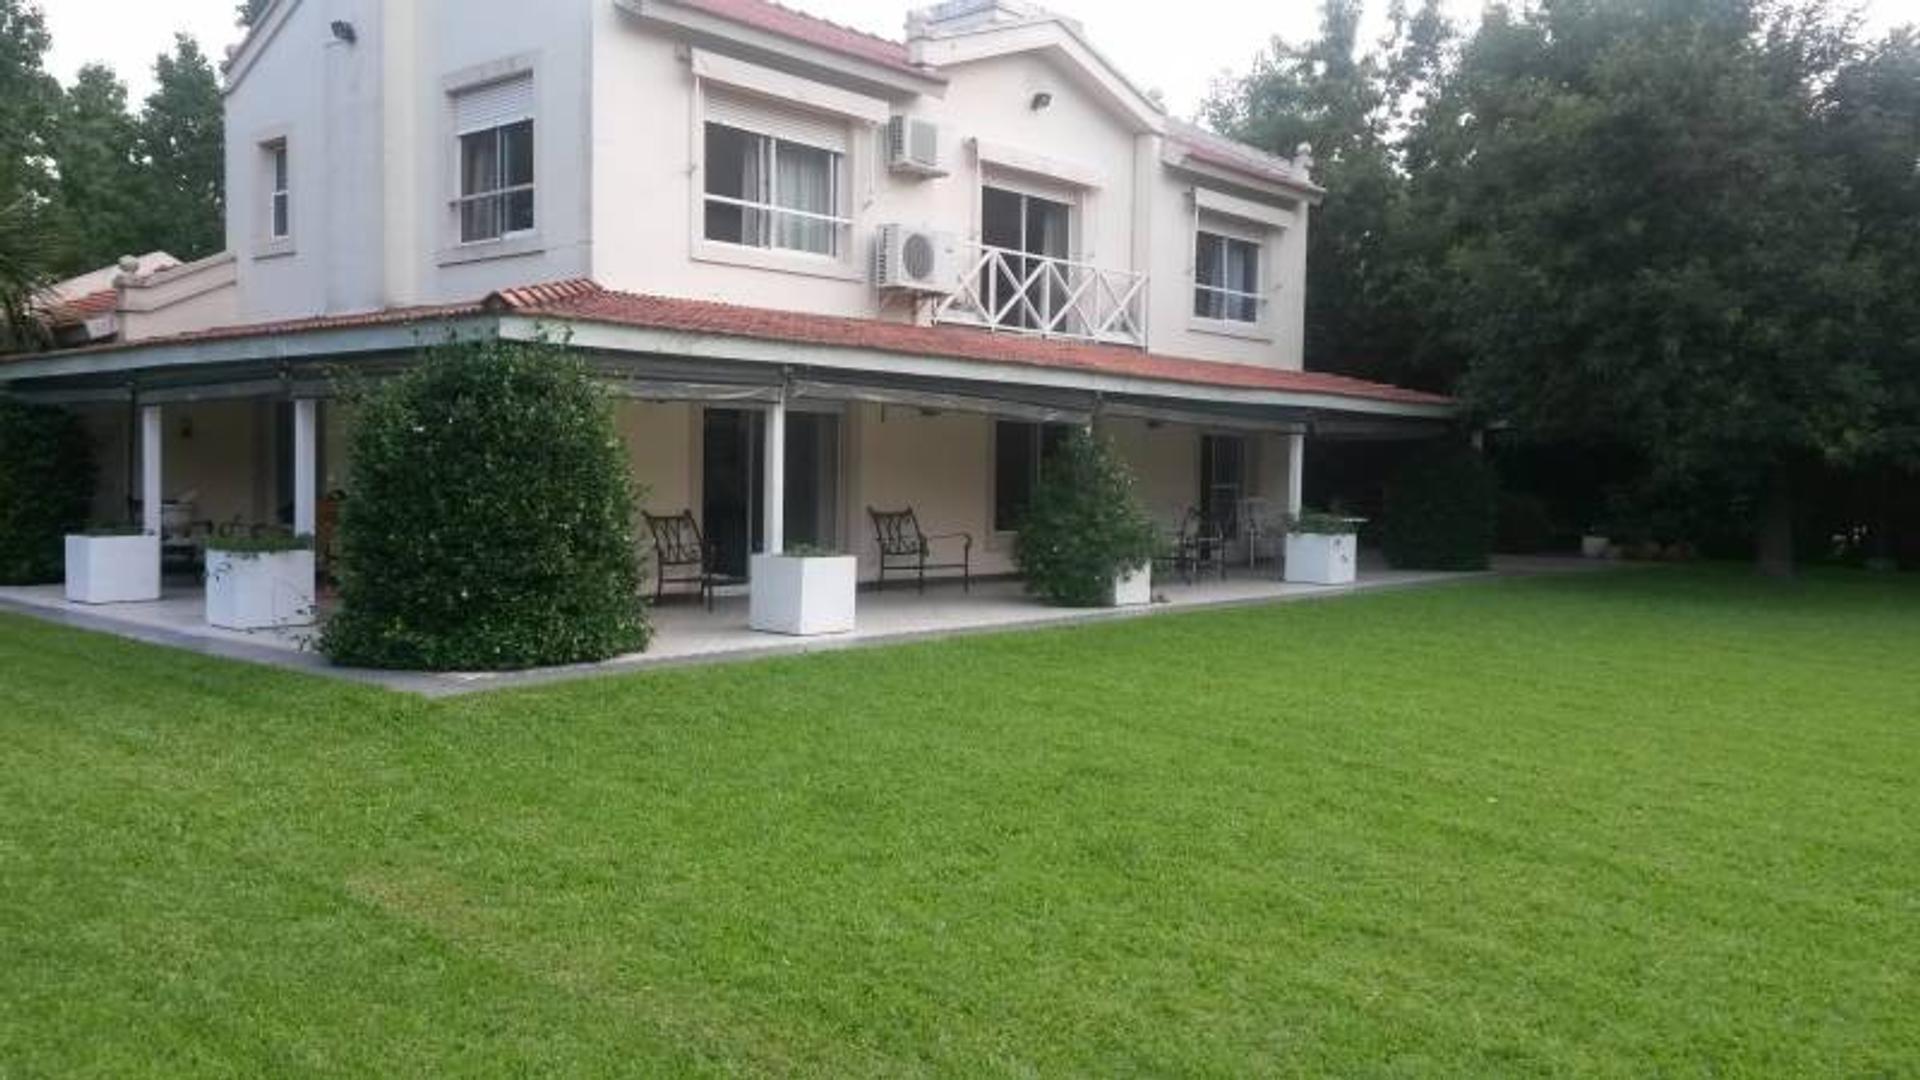 Casa en Venta ubicado en Altos de Pilar